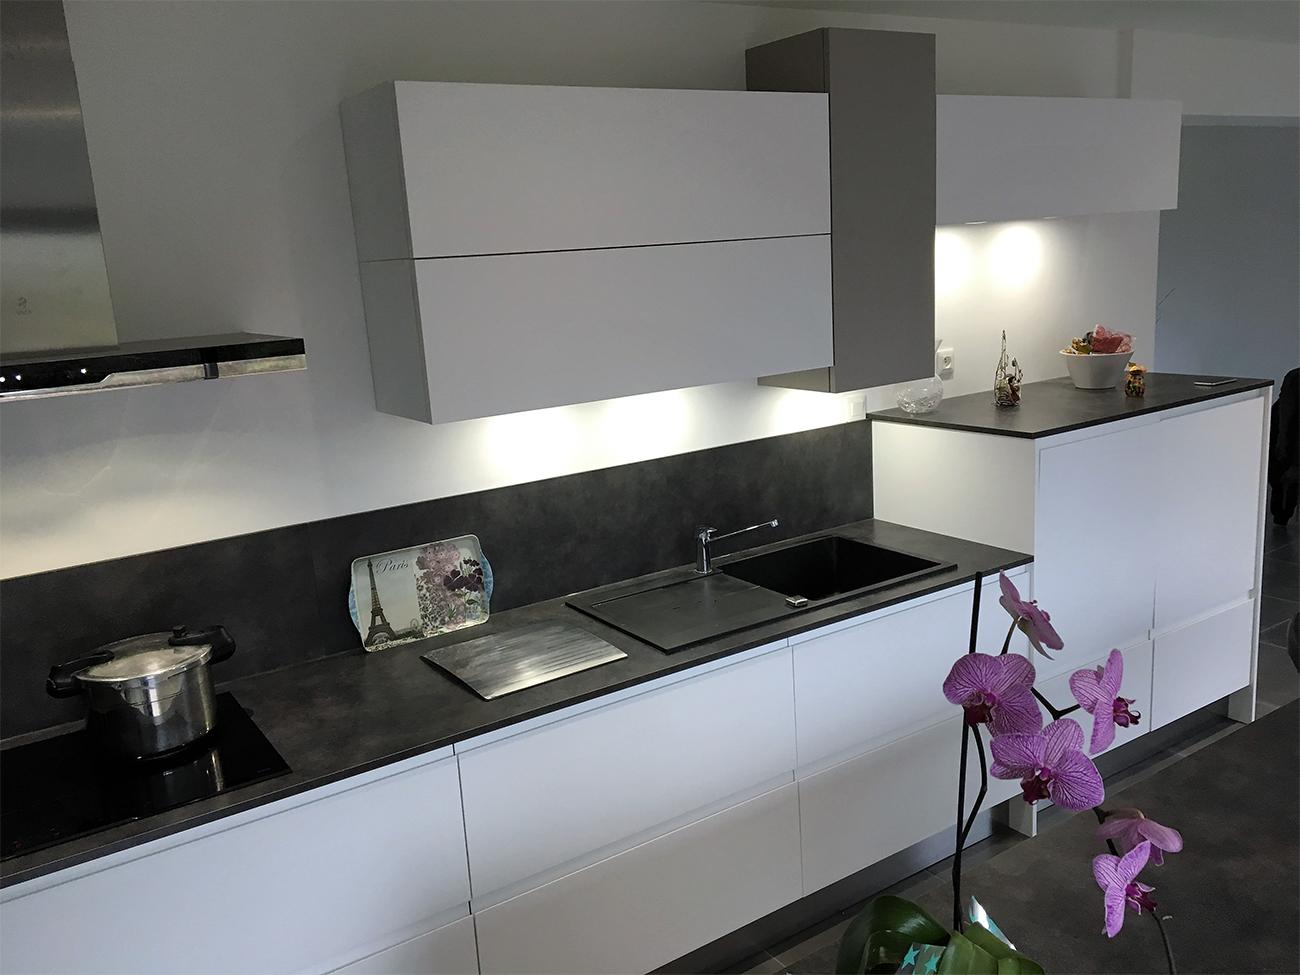 cuisine quipe ilot central modle rondo duixina cuisine. Black Bedroom Furniture Sets. Home Design Ideas